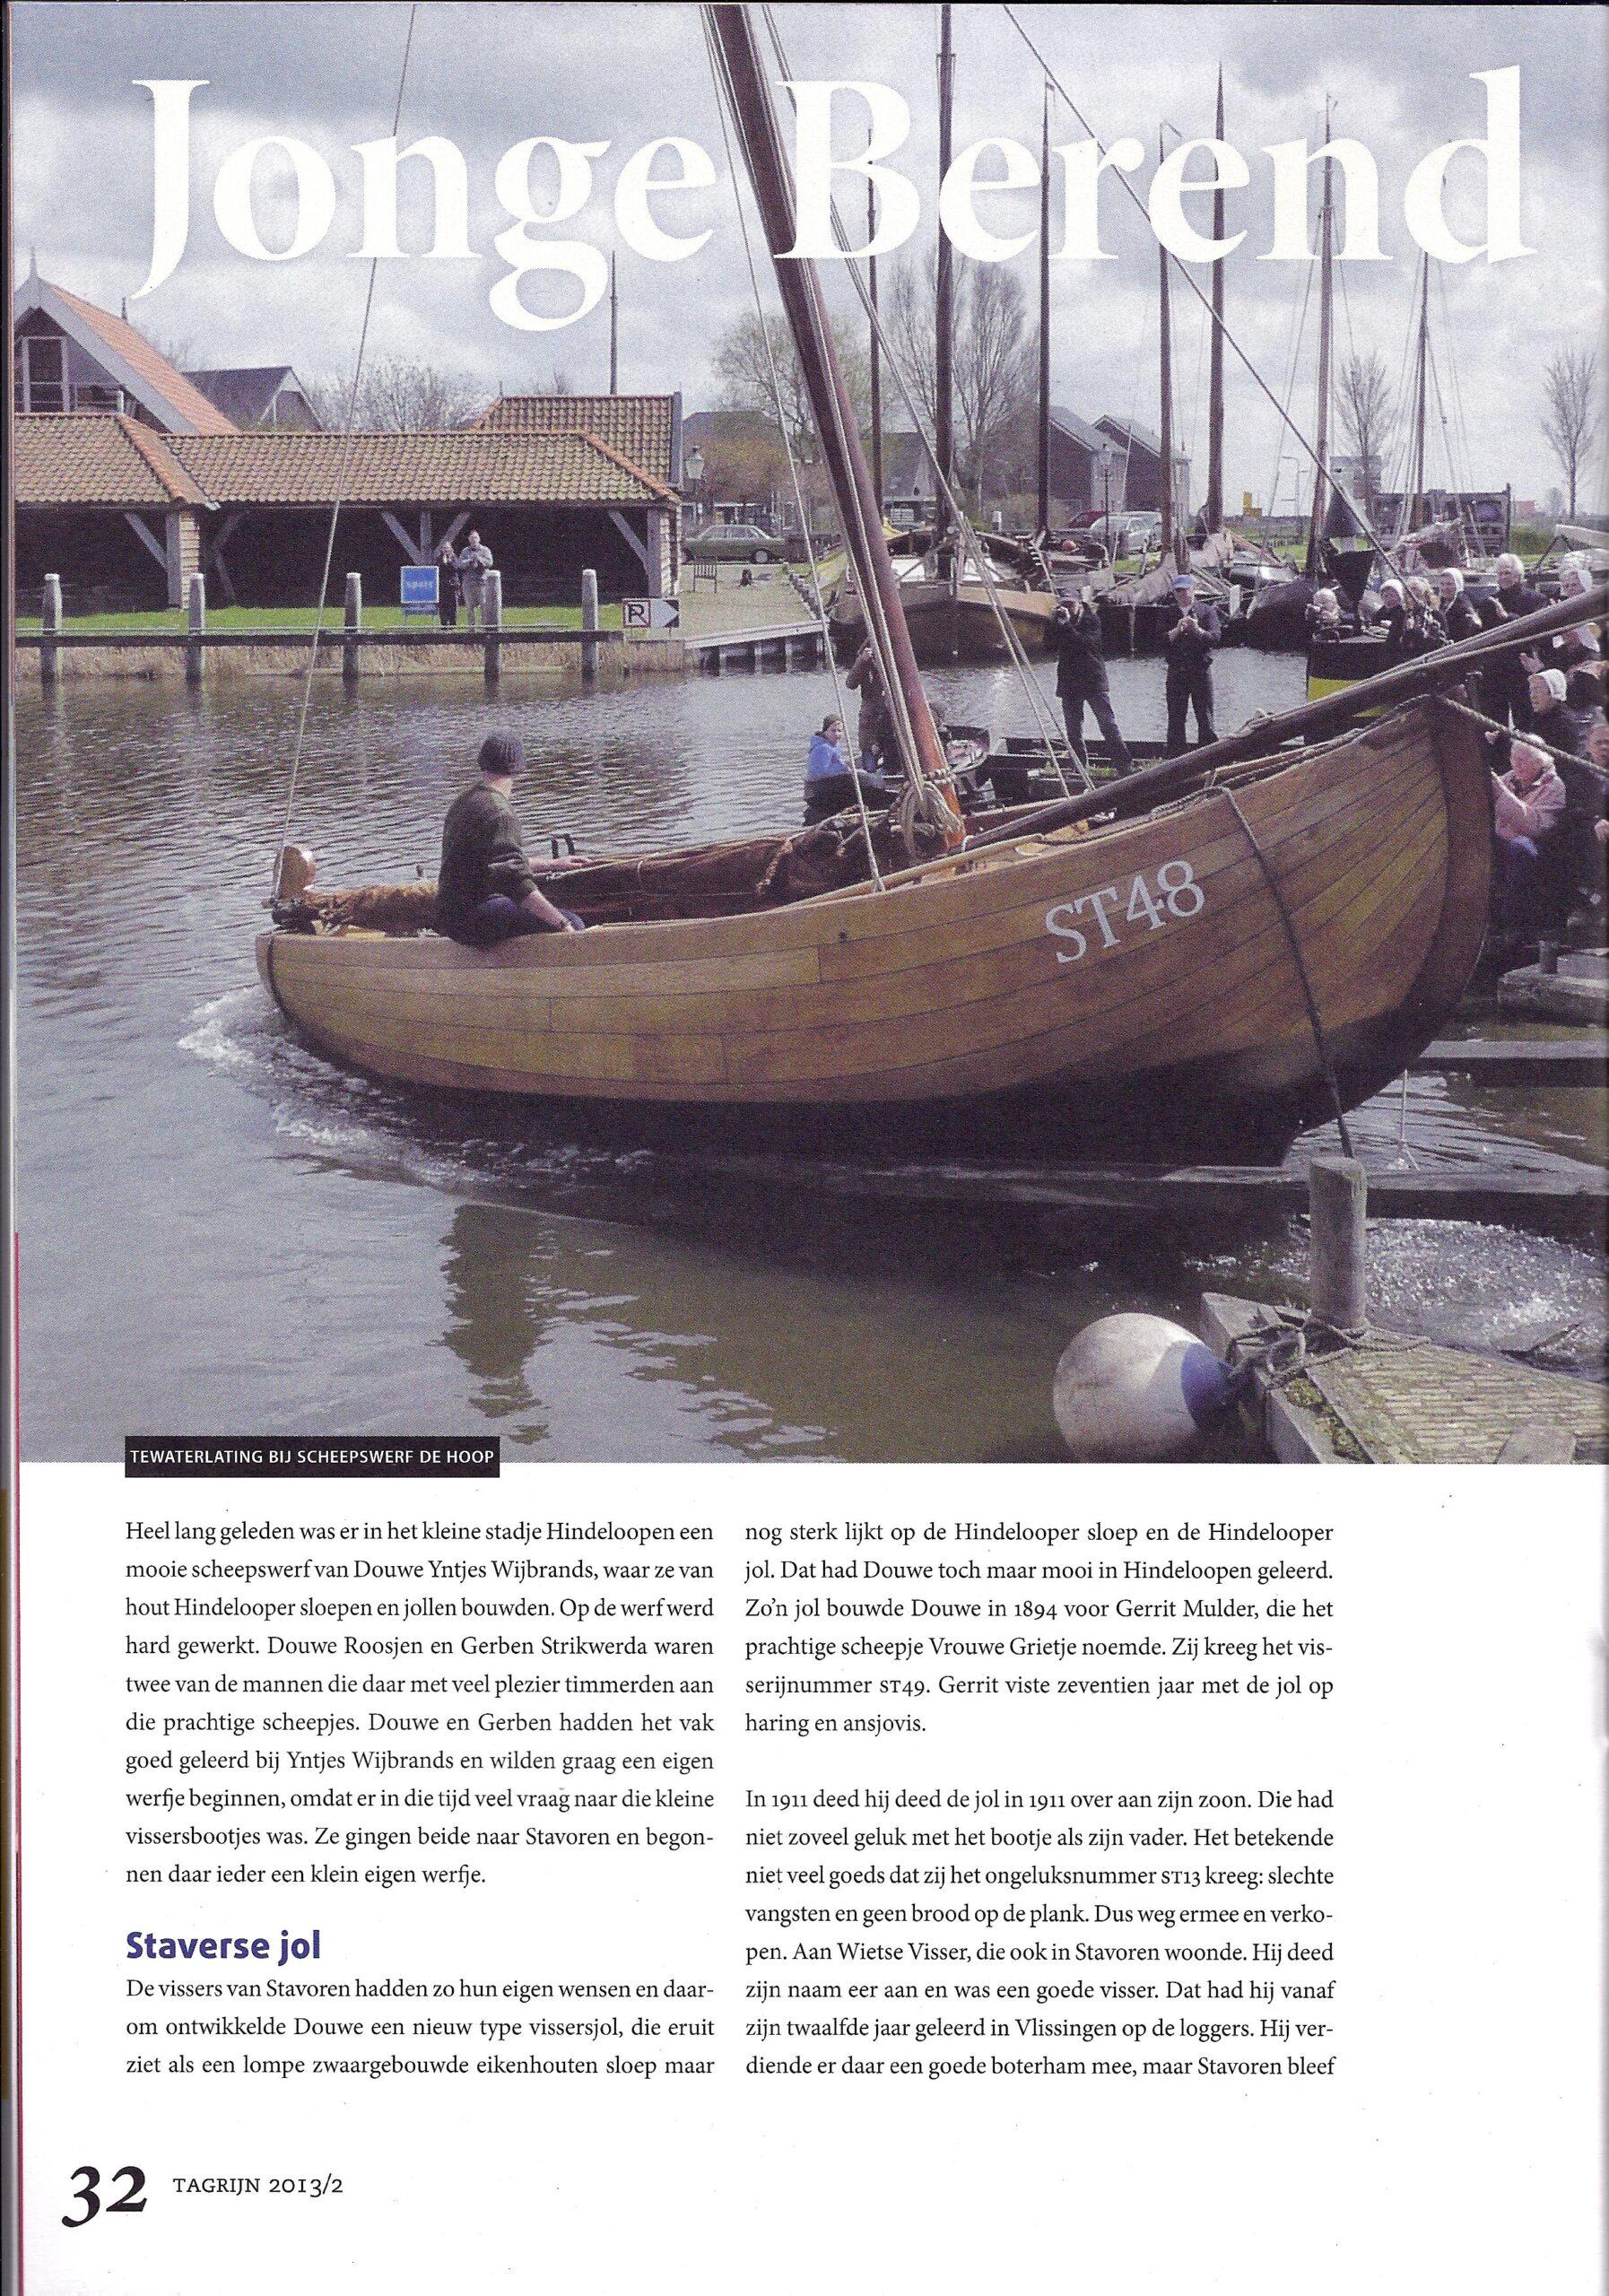 Tagrijn 2013 |tewaterlating ST48 | Pagina 1.